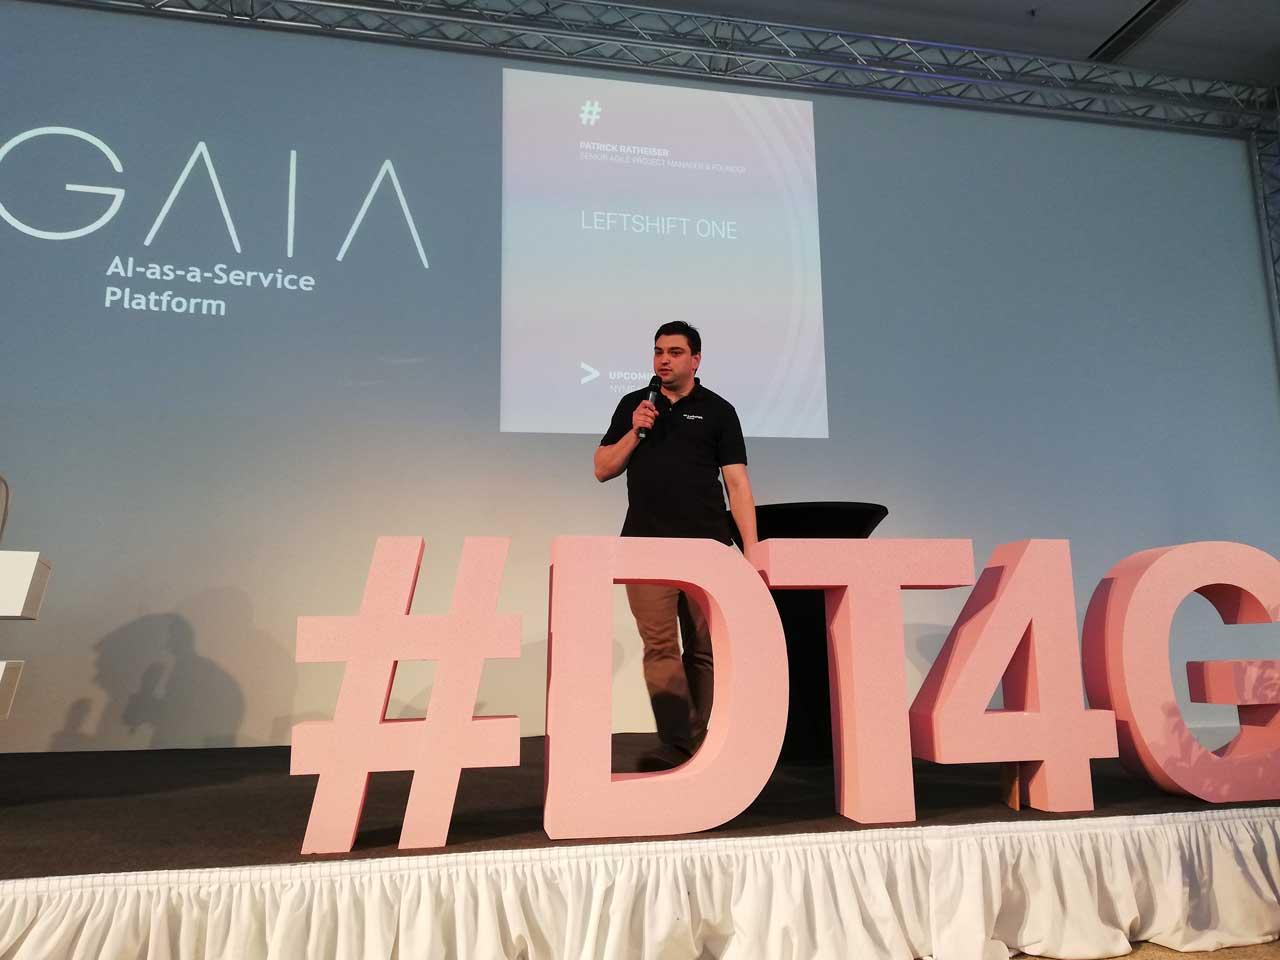 Patrick Ratheiser präsentiert E-Mail Automation mit G.A.I.A.